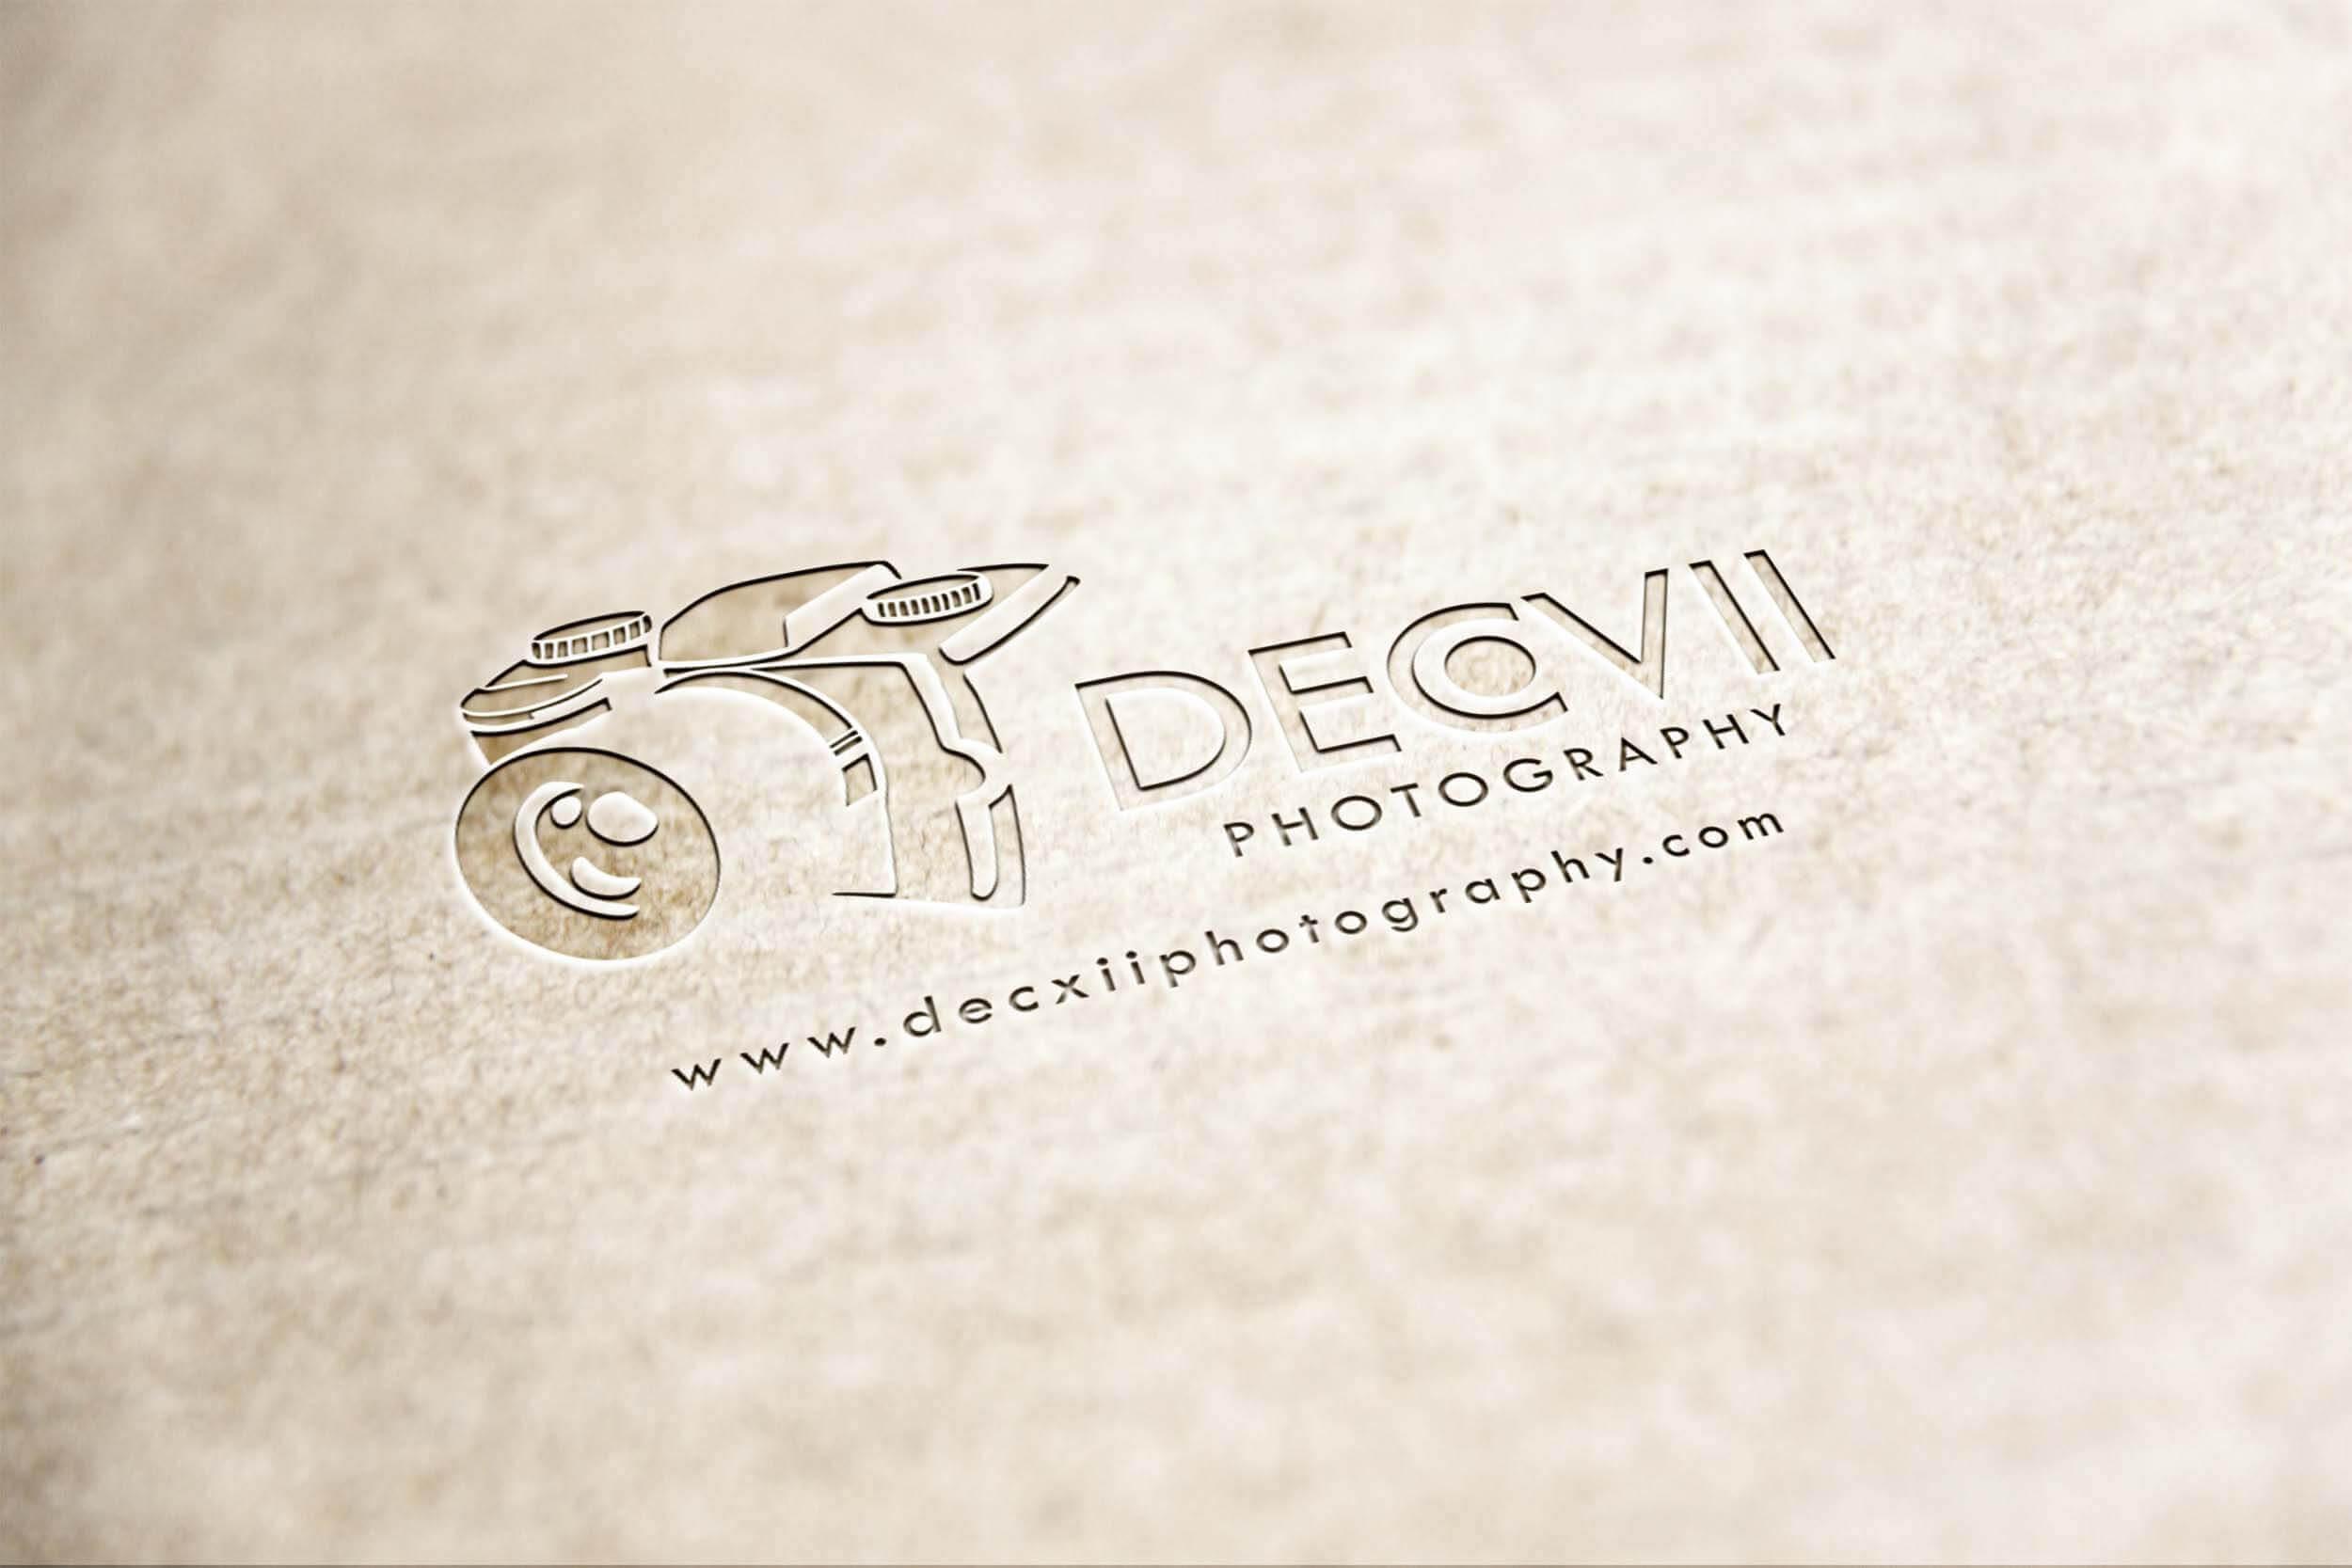 December VII Photography Logo Design